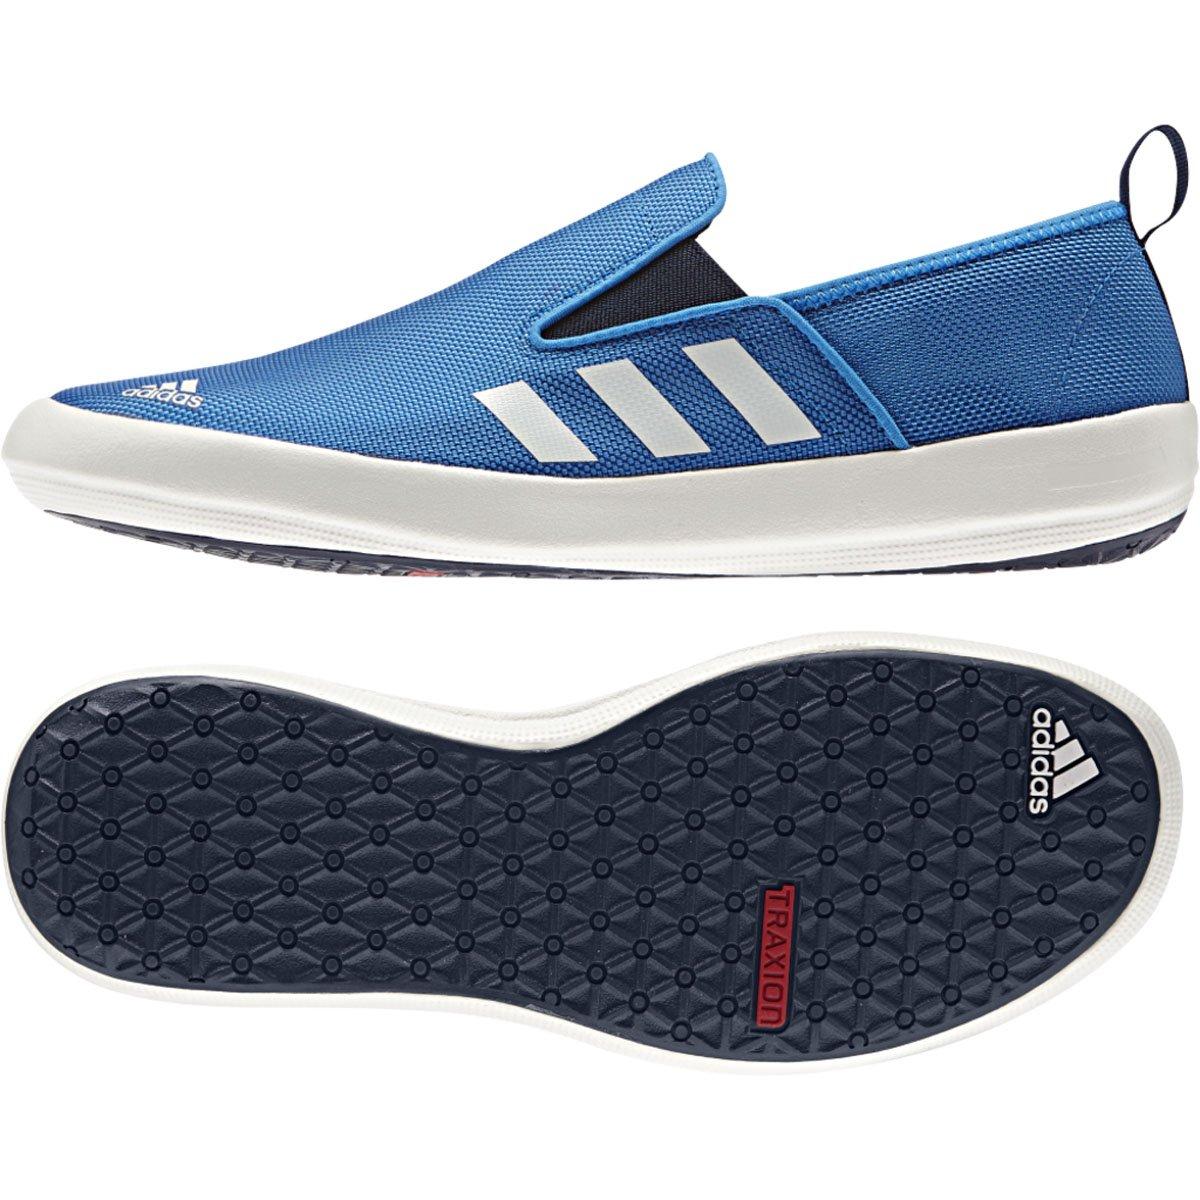 Adidas Outdoor Men's B Slip-on Dlx Water Shoe